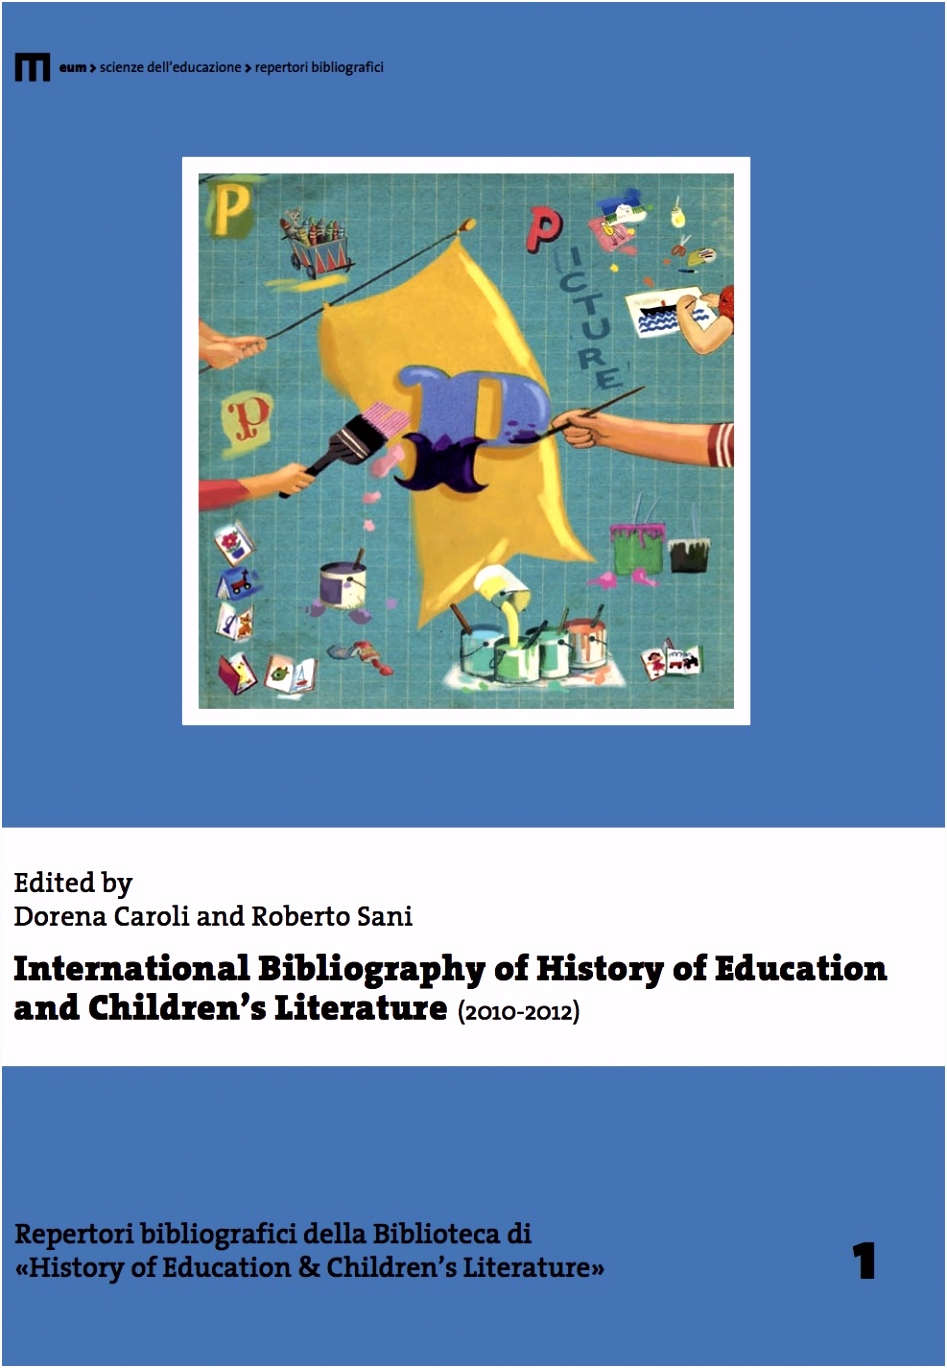 Caroli D & Sani L Eds International Bibliography of History